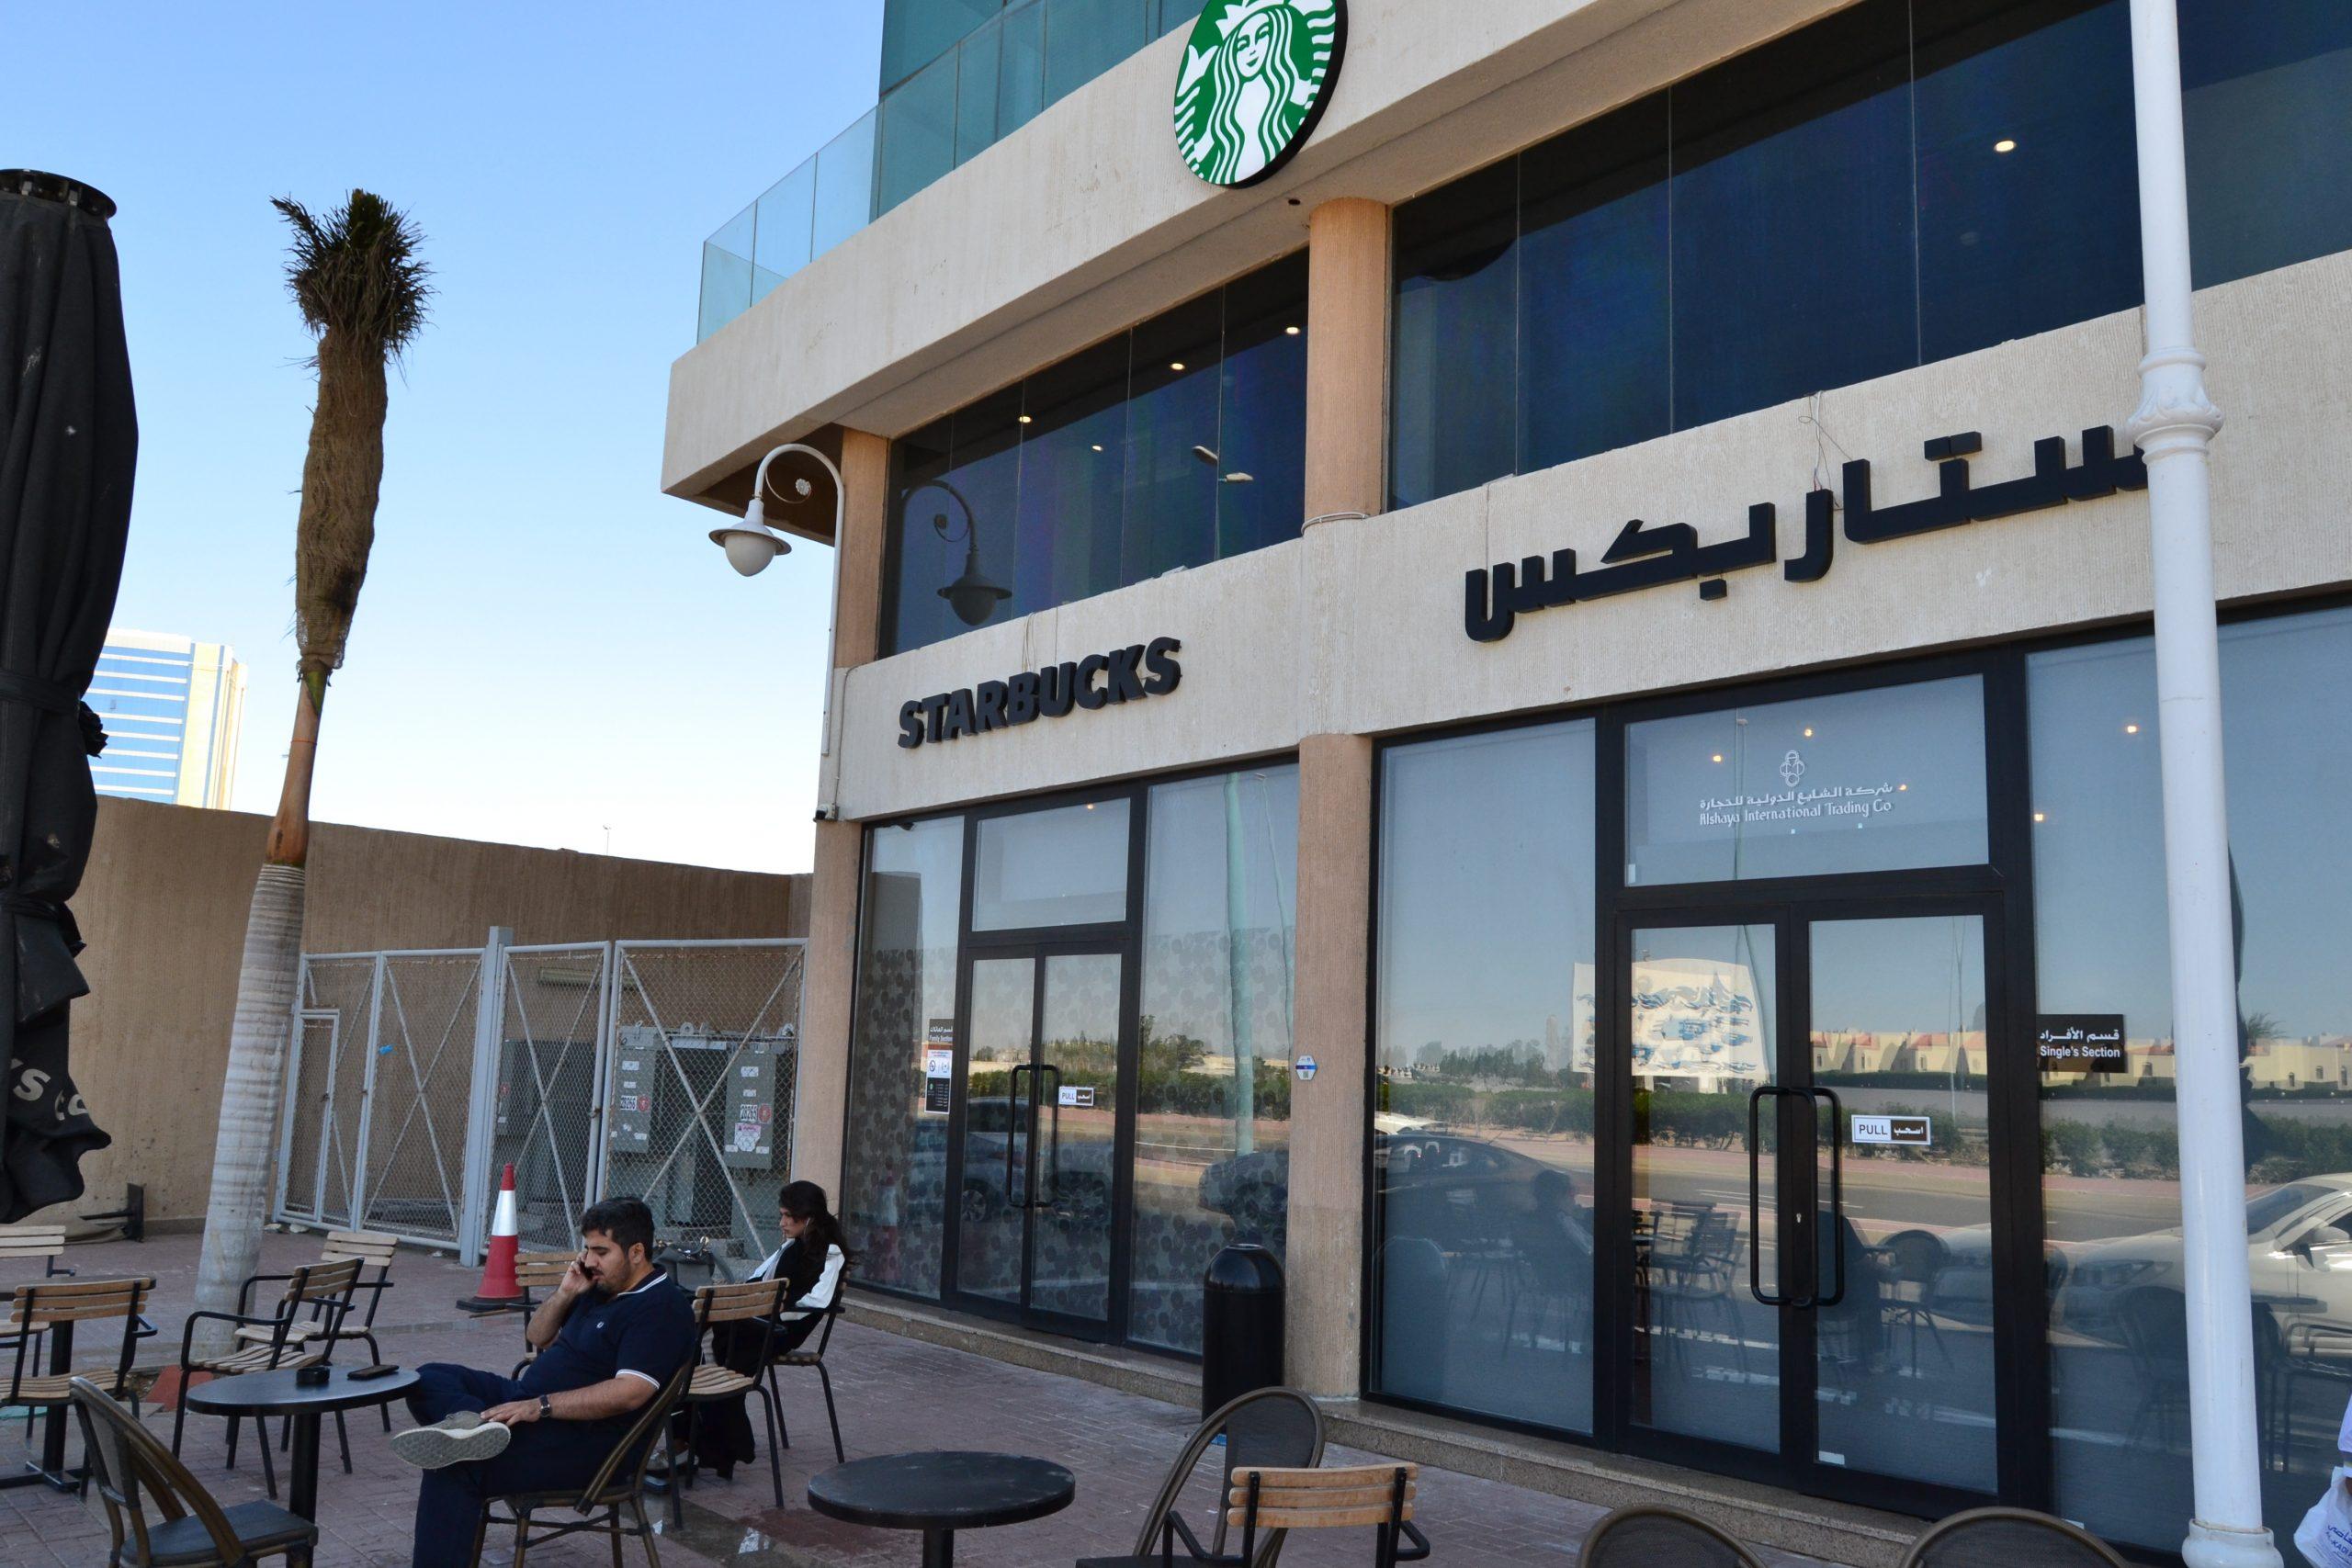 STARBUCKS-Jeddah gallery